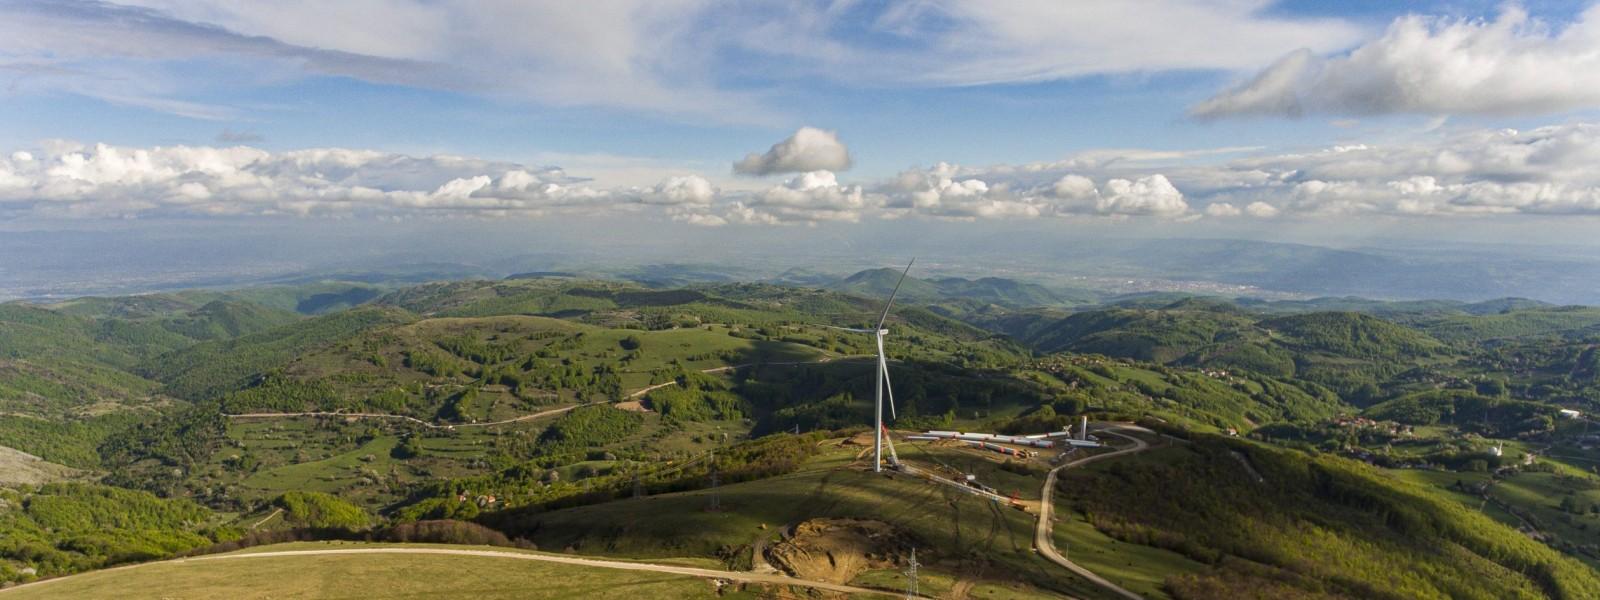 Windfarm in Selac